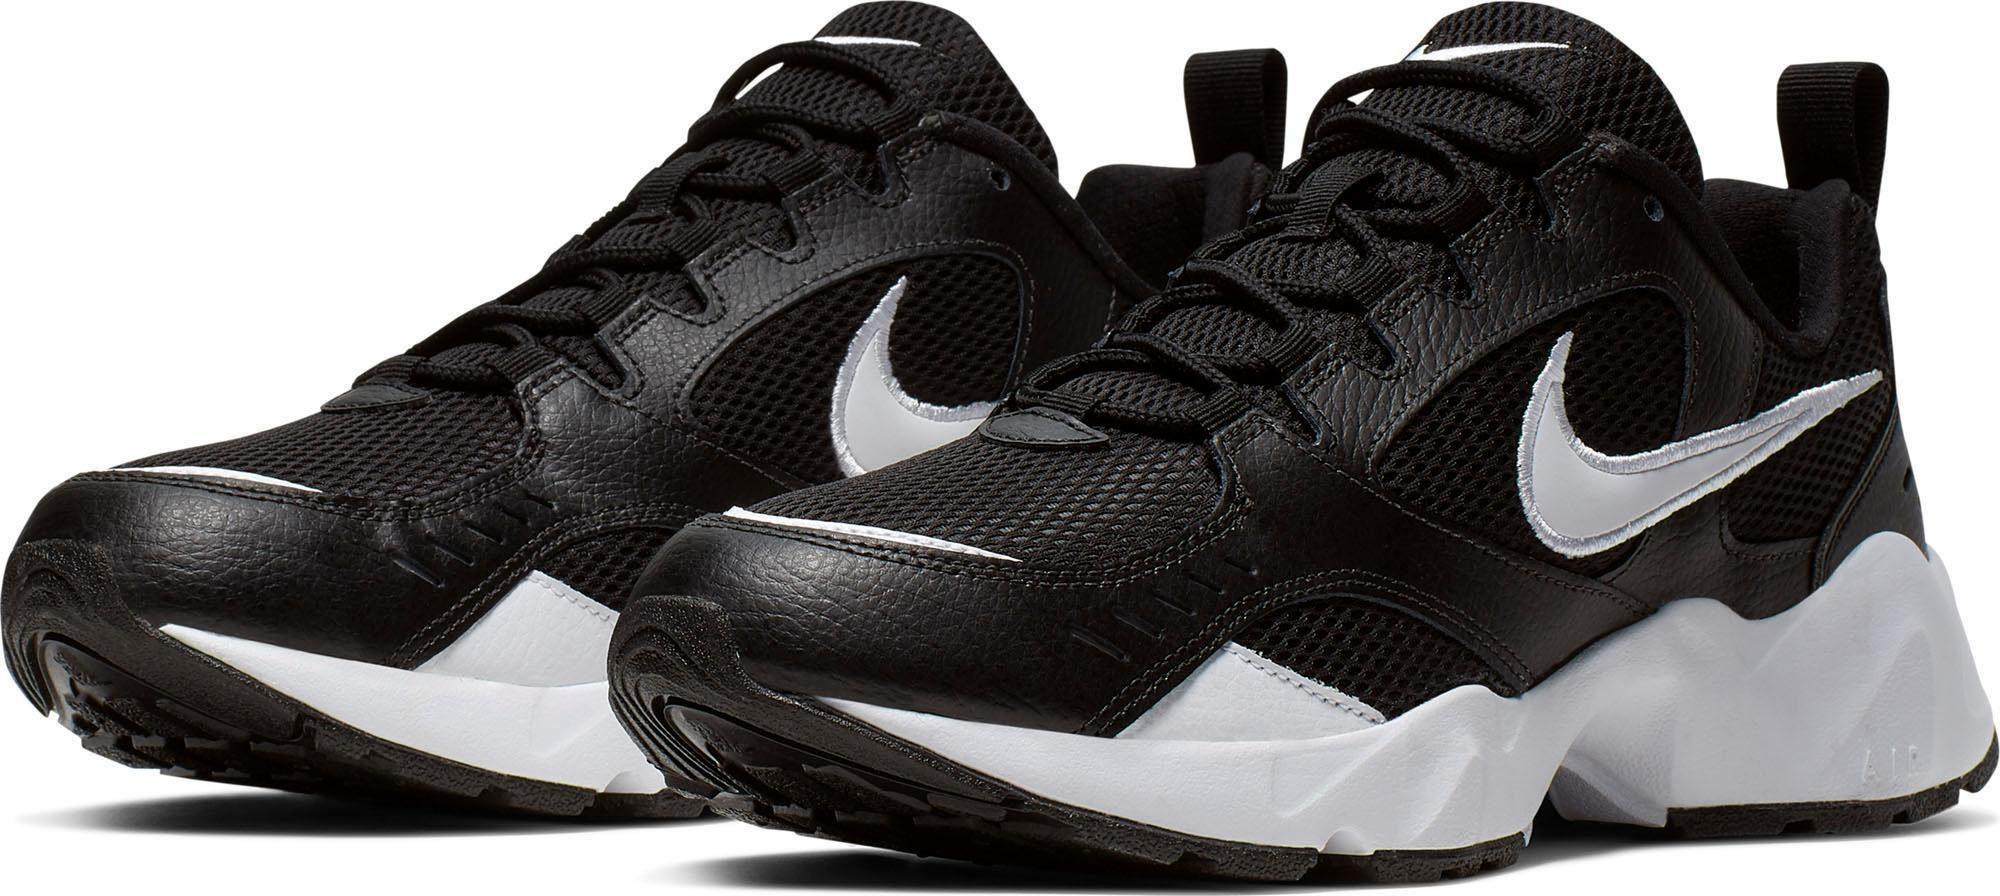 Nike Sportswear »Air Heights« Sneaker, Stylischer Sneaker von Nike Sportswear online kaufen | OTTO